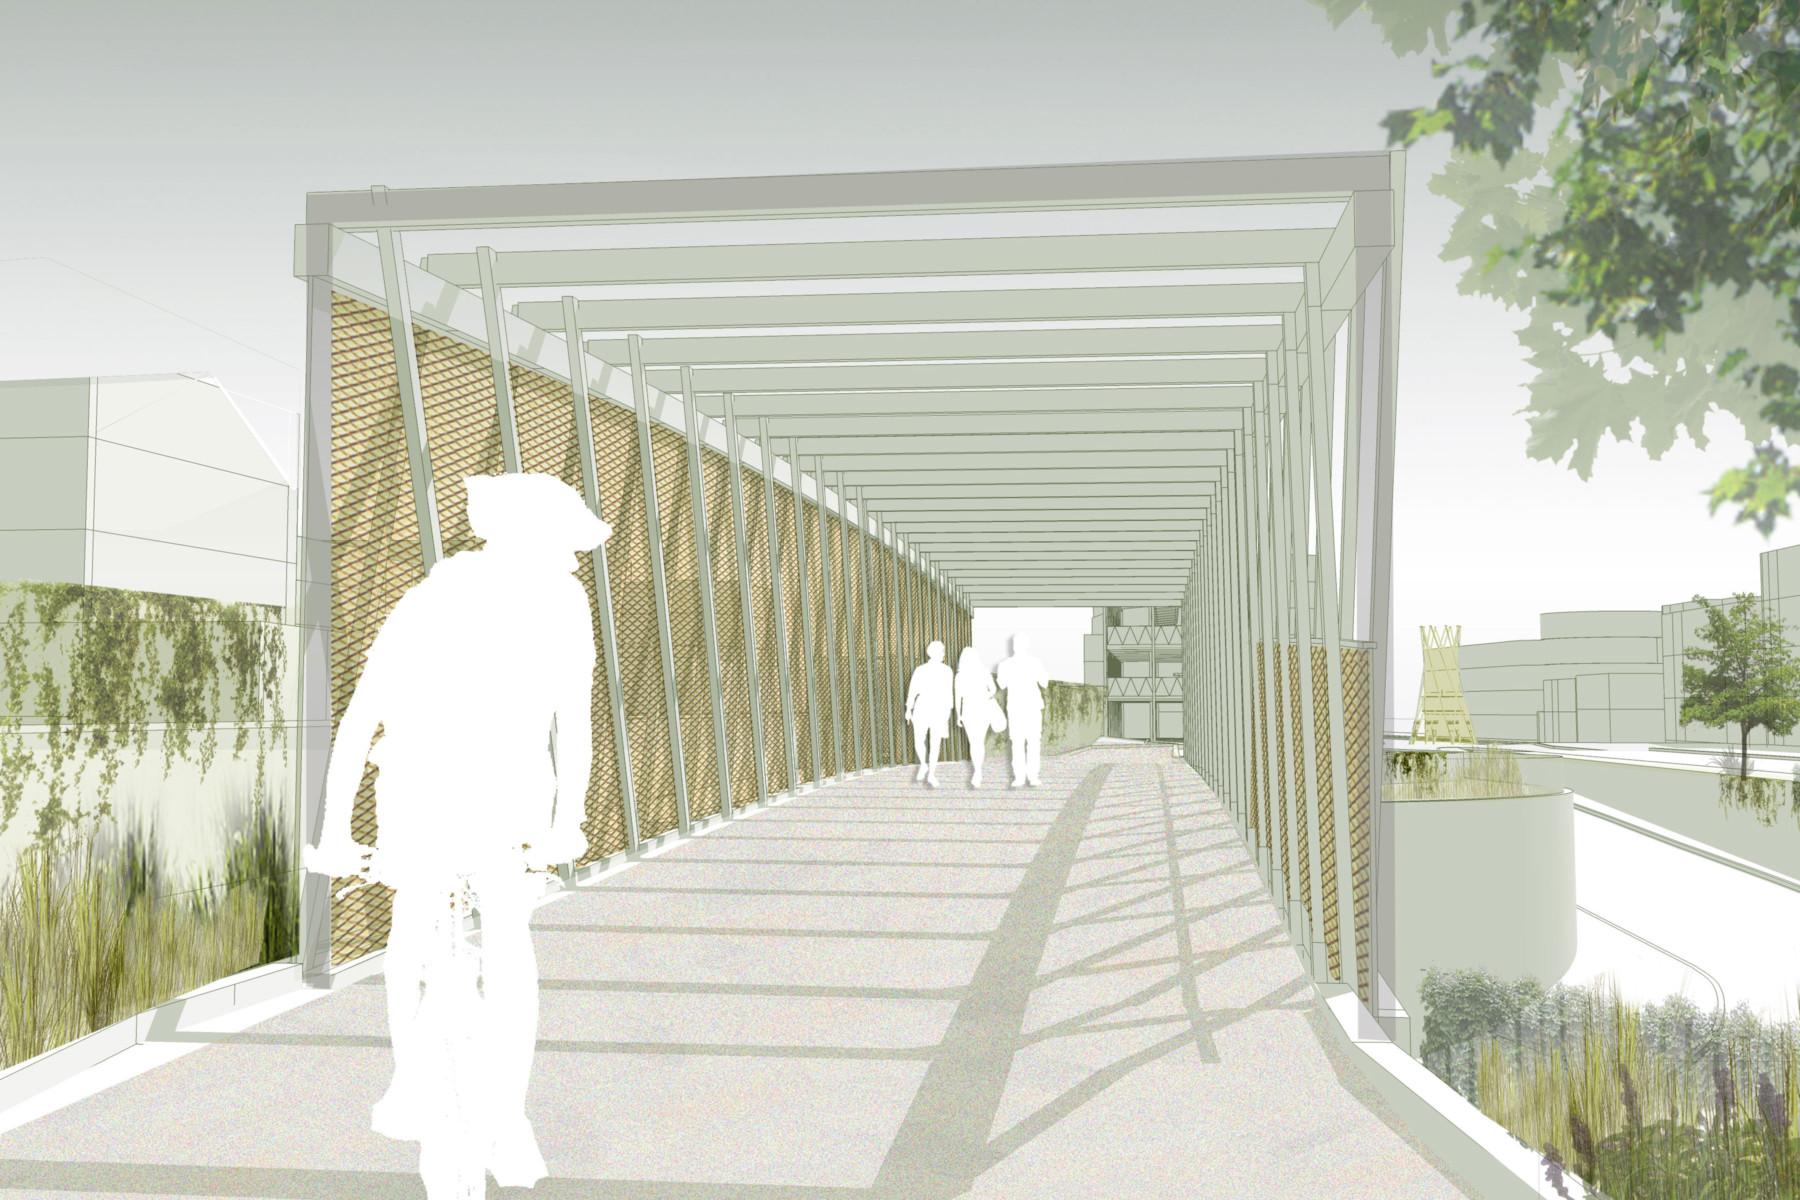 Sarah-Wigglesworth-Architects Kingston-Mini-Holland Bridge 4 Streetview 3600